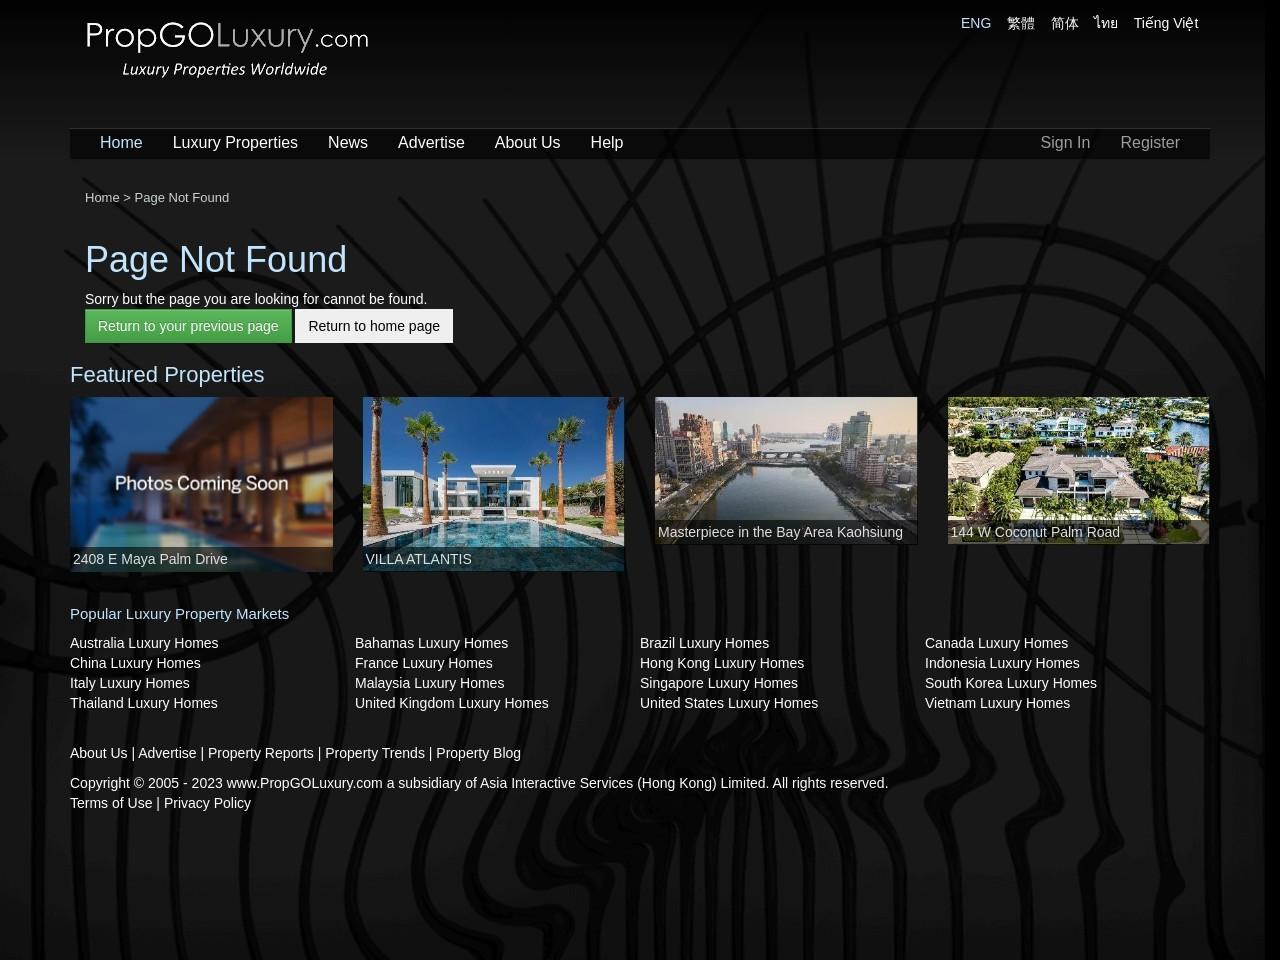 Lake Lure – Apple Valley Villa #27 For Sale on PropGOLuxury